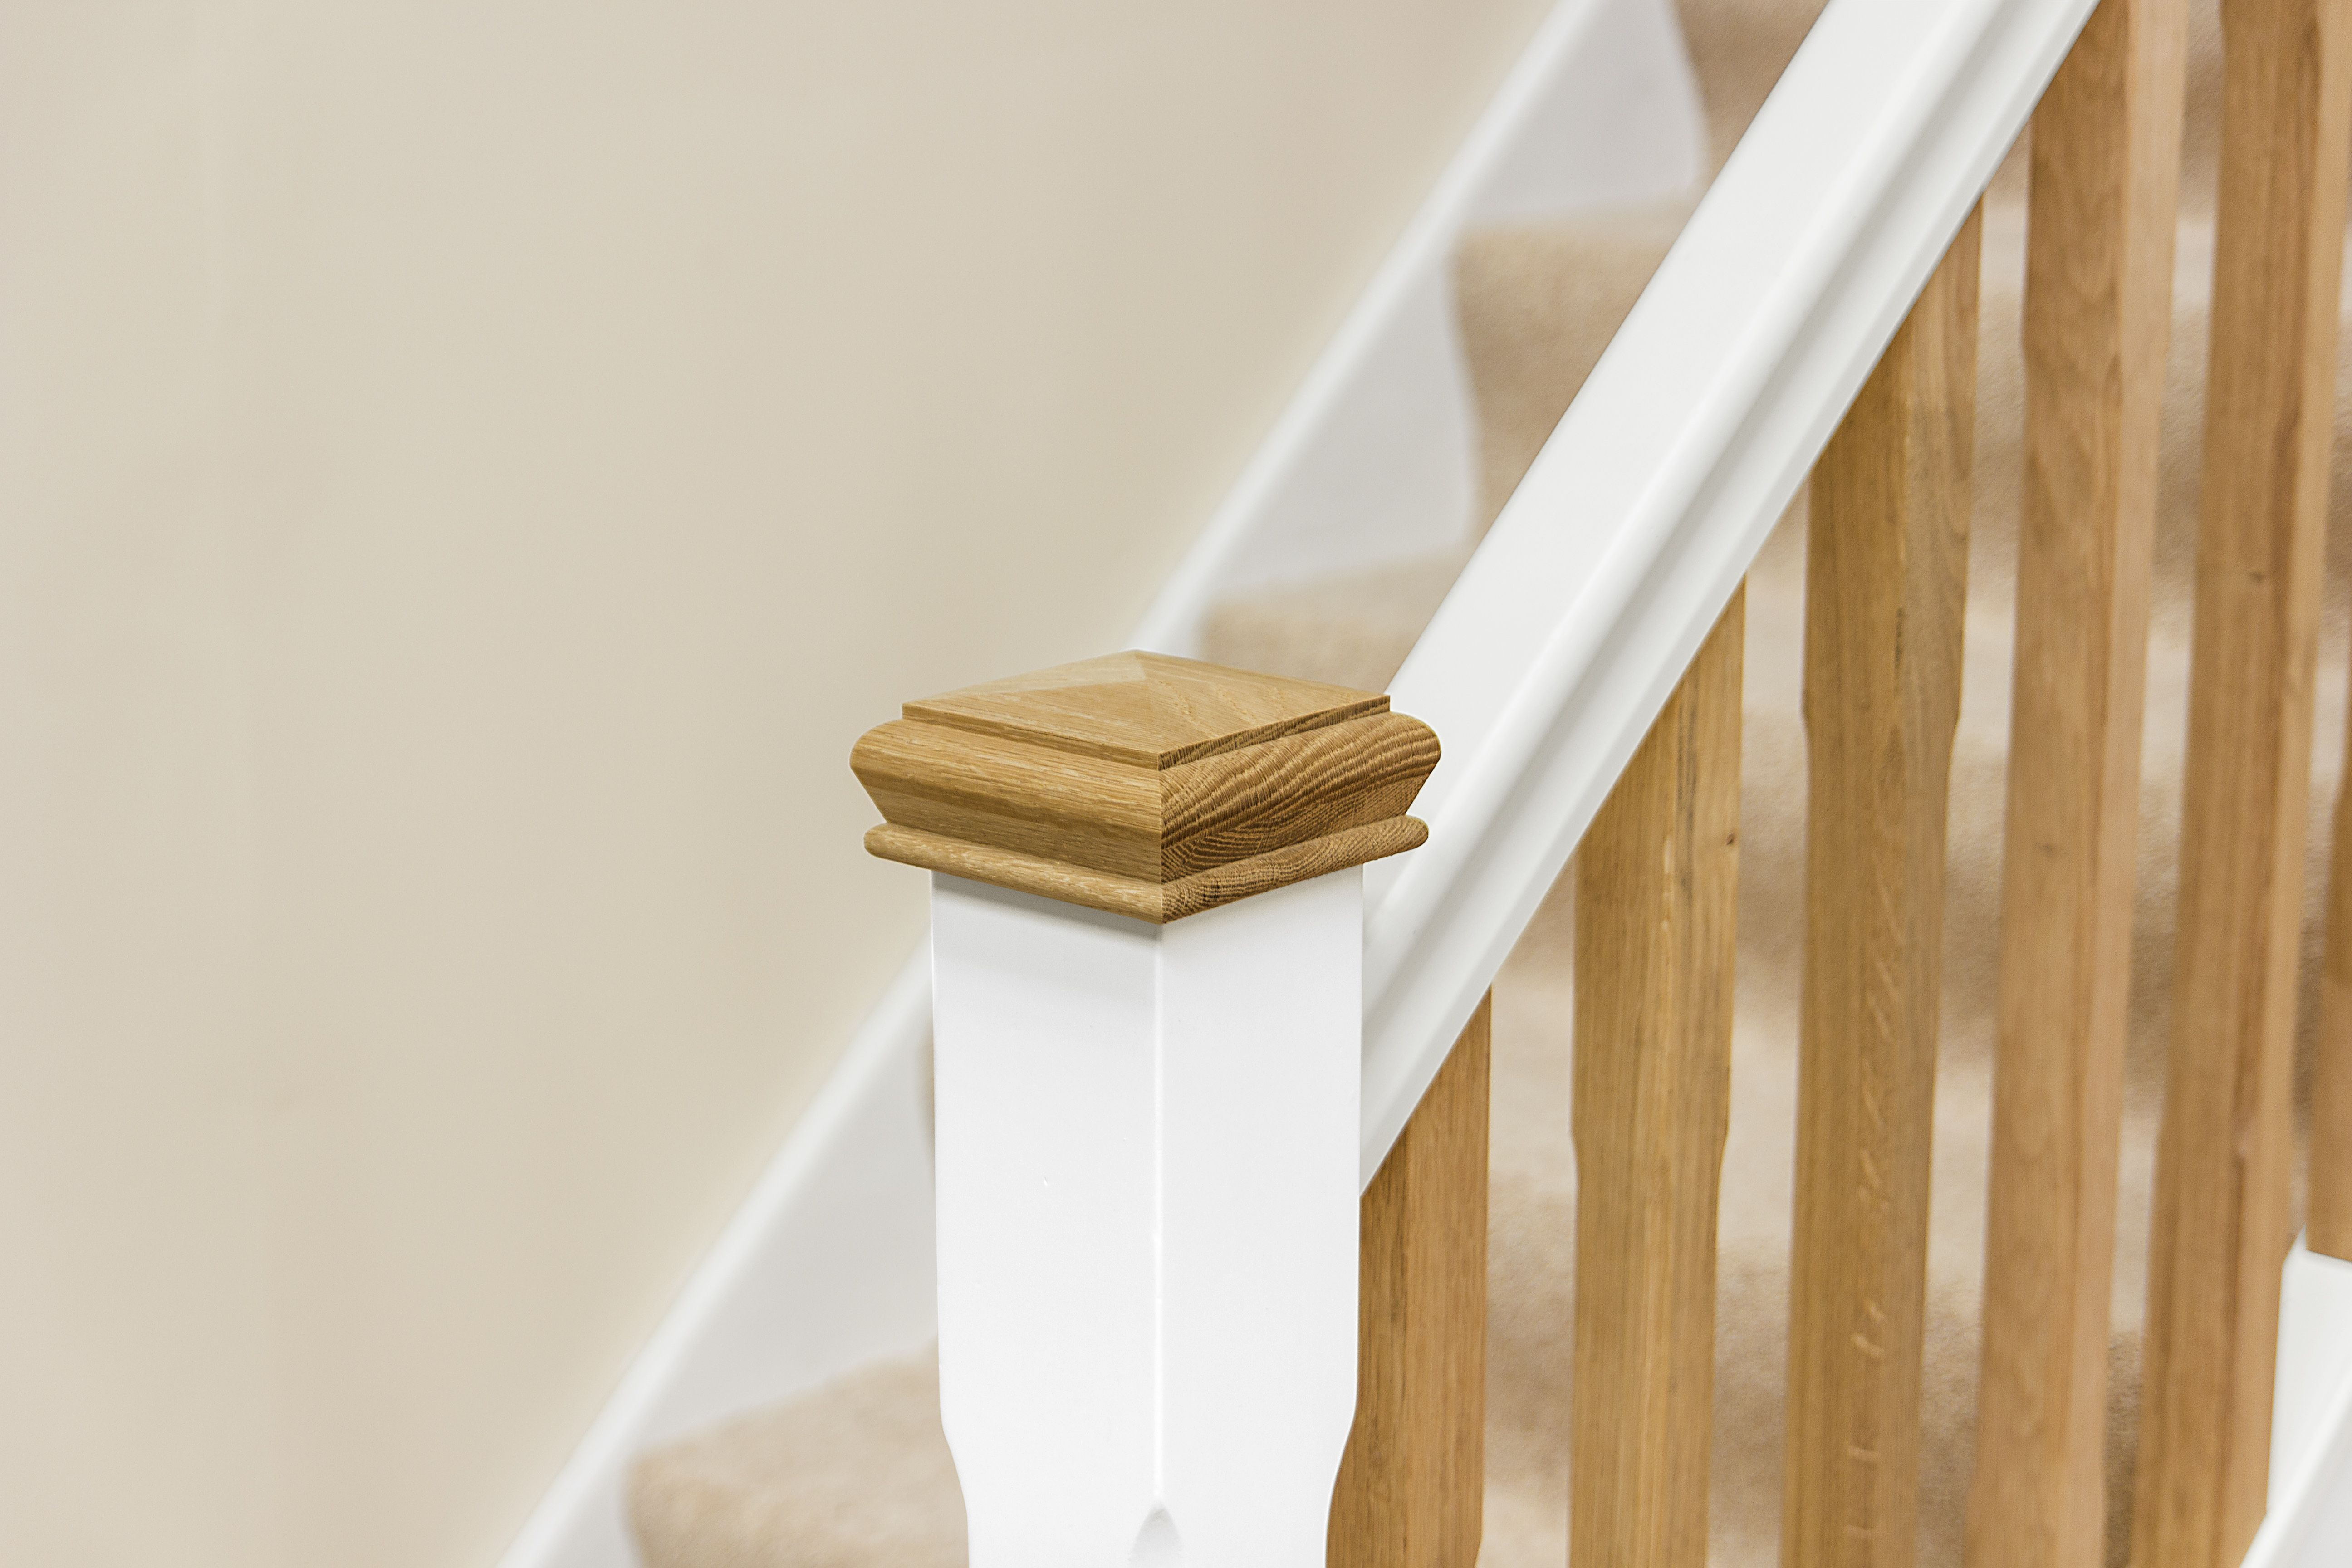 White Primed Handrail With Oak Spindles Handrail Design Oak   White Handrails For Stairs Interior   Grey Treads   Safety   Richard Burbidge   Ship Lap   Aluminum